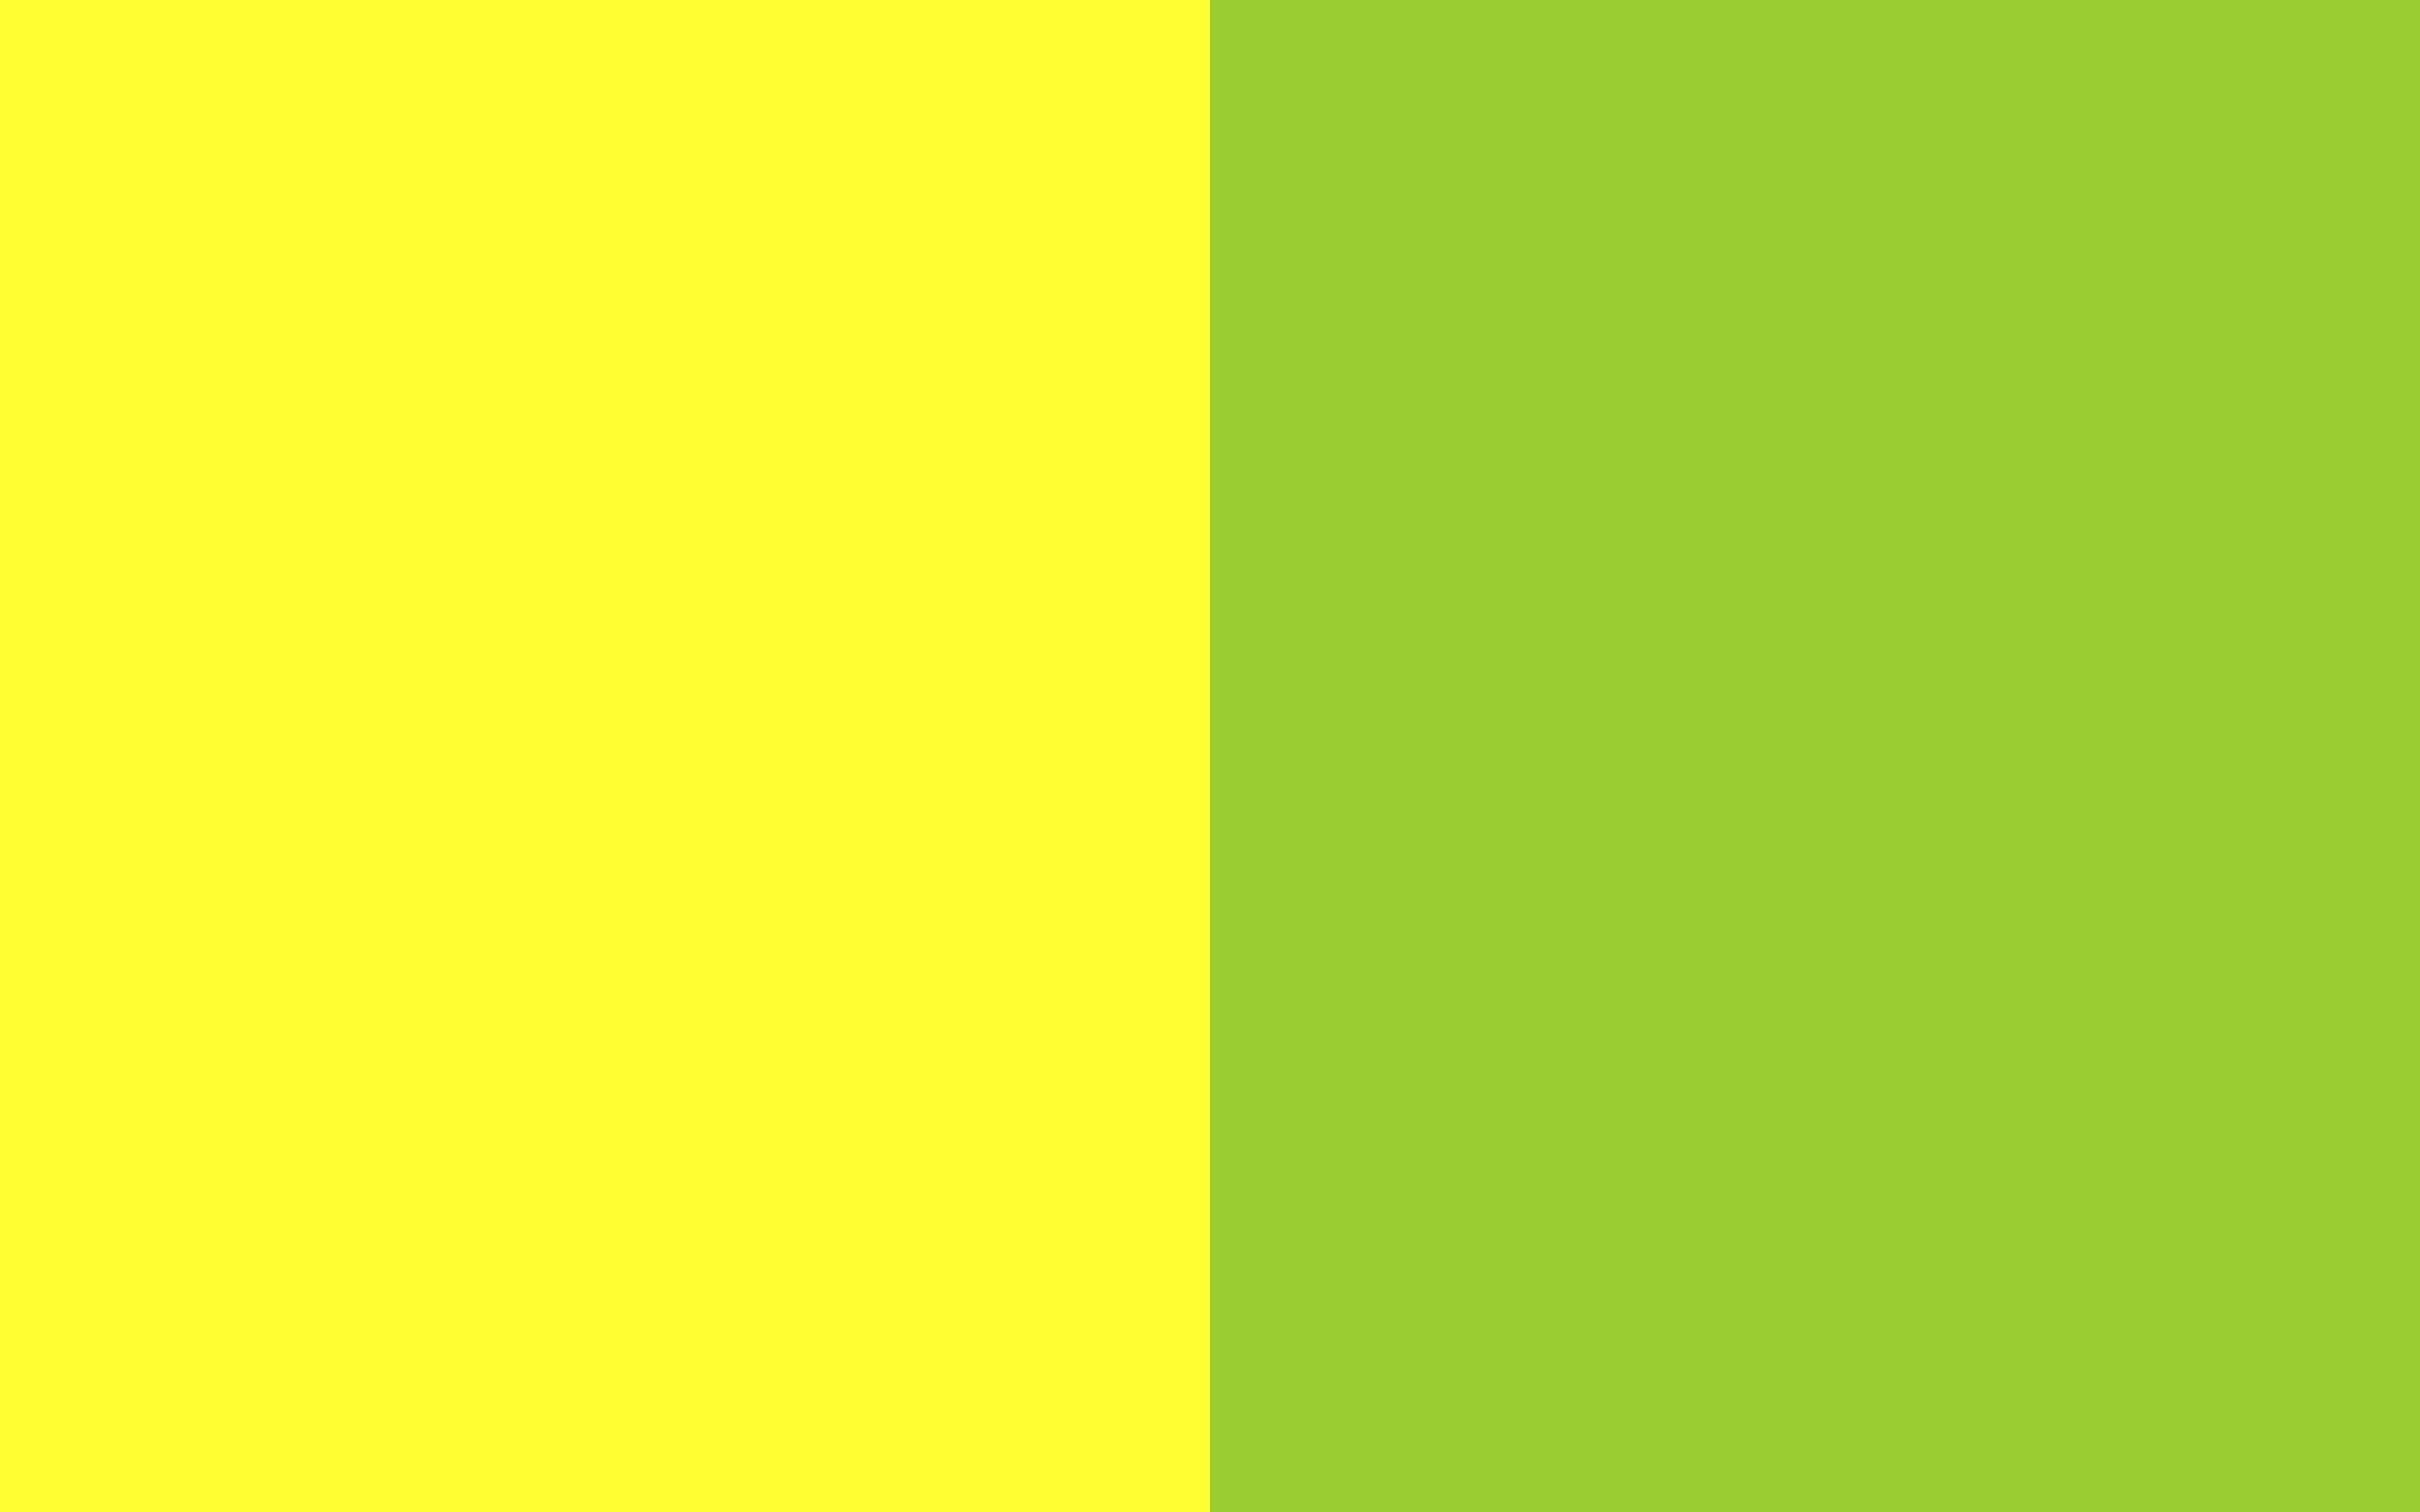 2 Color Combination Yellow And Green Wallpaper Wallpapersafari